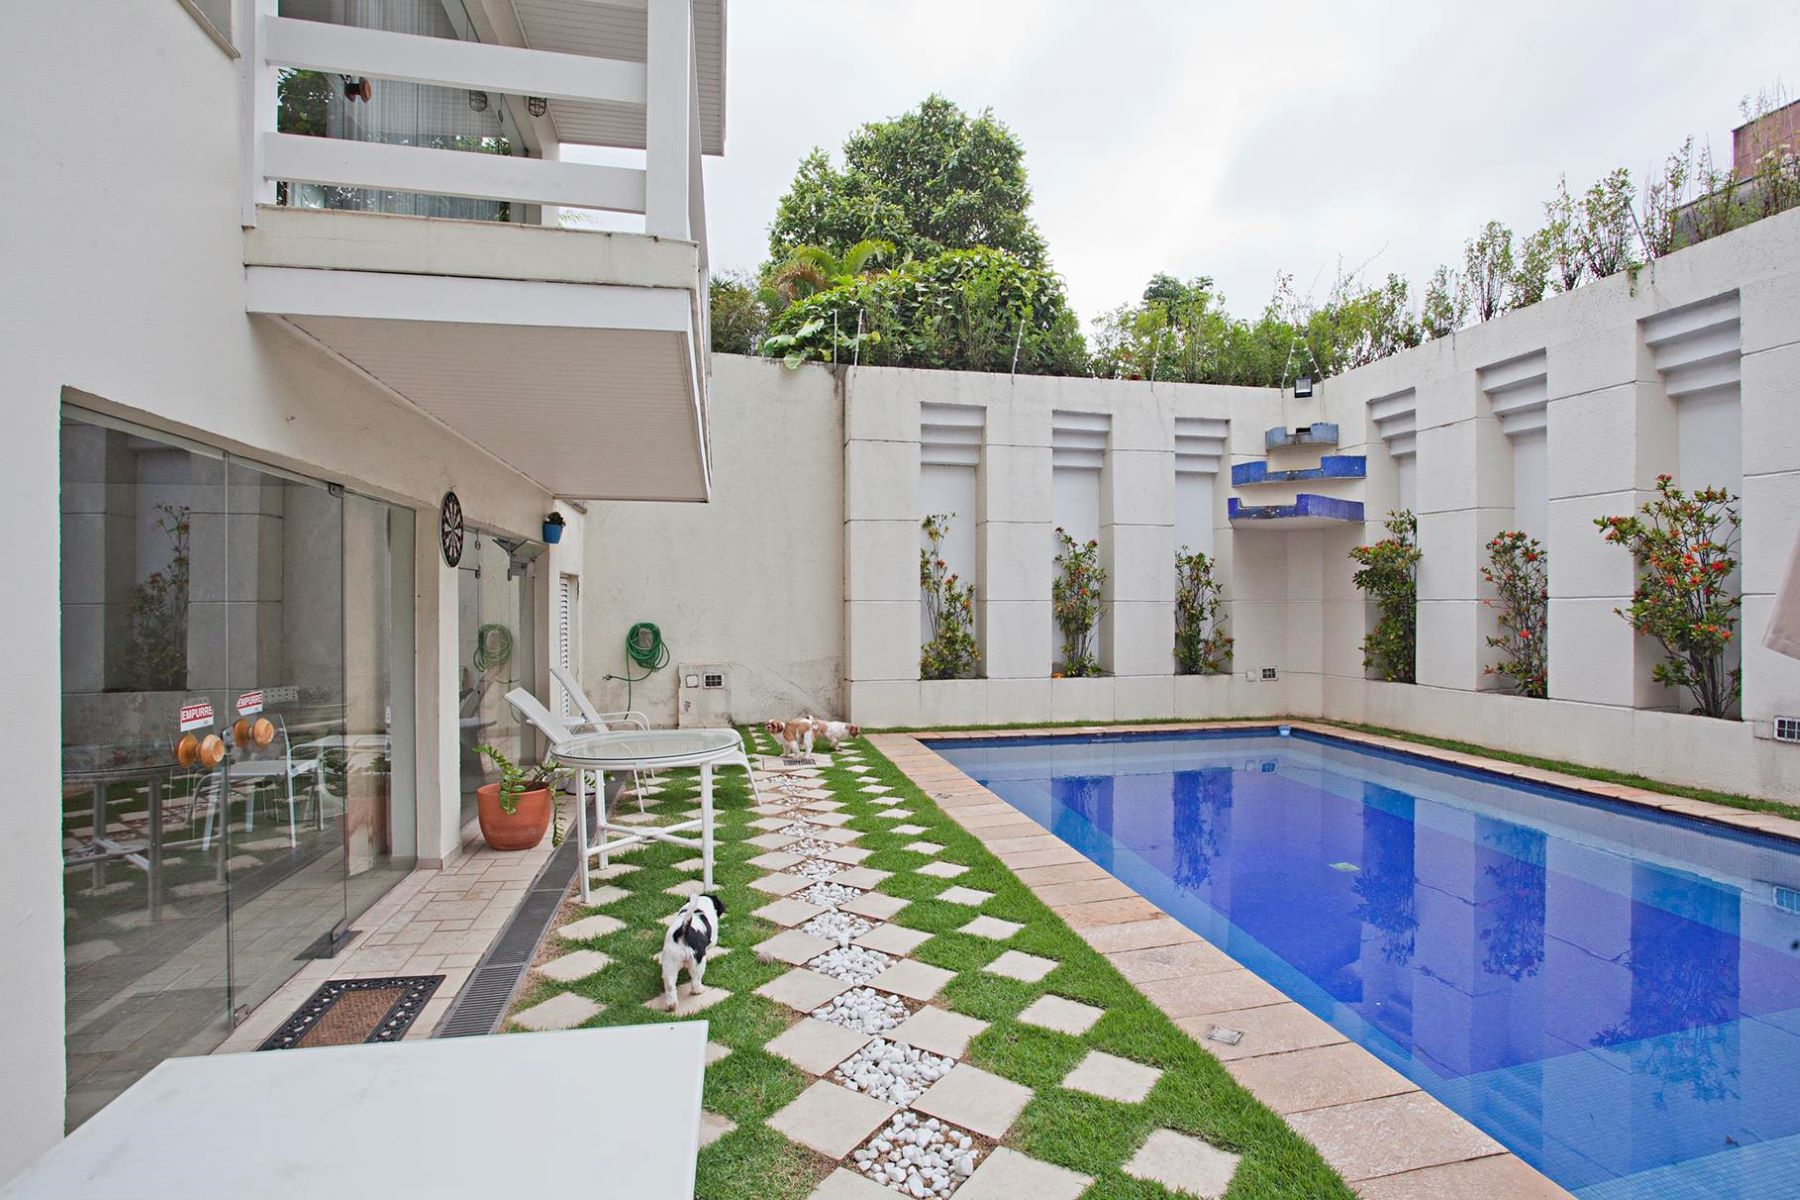 Single Family Home for Sale at Spacious House with Great Leisure Area Rua Anatólia Sao Paulo, Sao Paulo 05471-000 Brazil